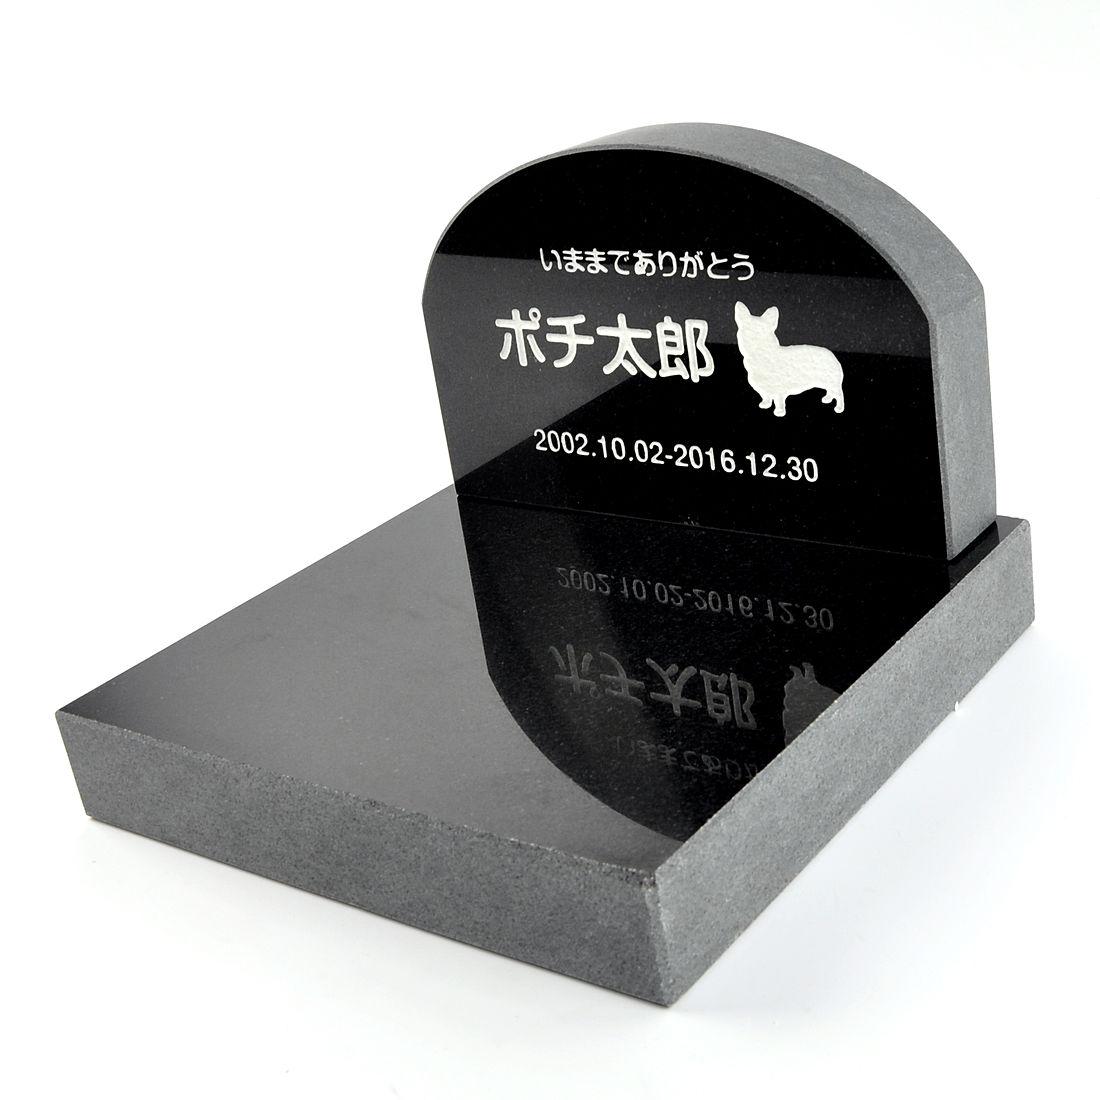 Pet&Love. ペットのお墓 天然石製 セット型 底板が厚く重いタイプ 御影石 ブラック アーチ  【HLS_DU】【楽ギフ_名入れ】 attr177attr ctgr2ctgr sml3sml+ctgr2ctgr DOG